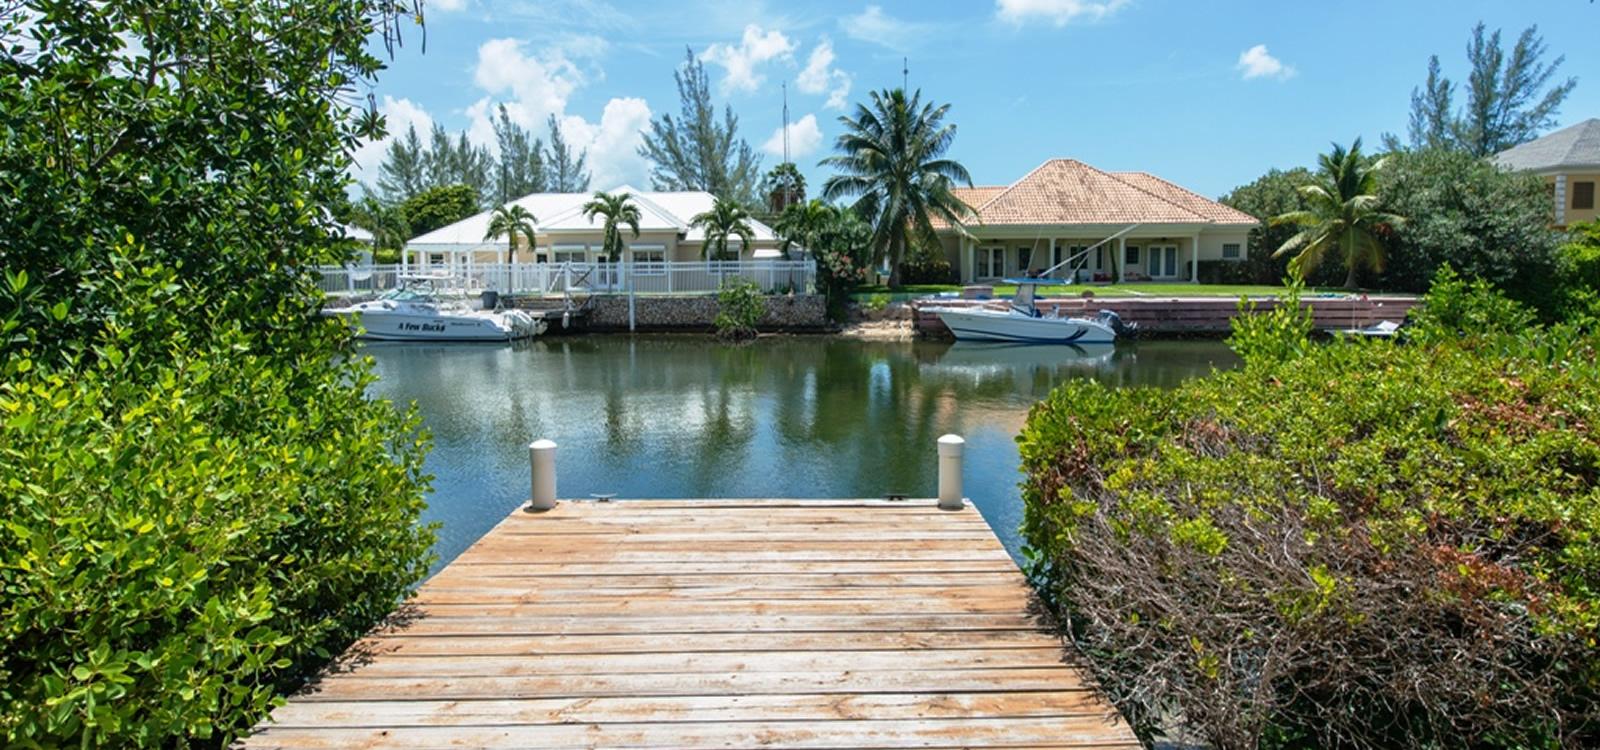 Cayman Islands - Wikipedia